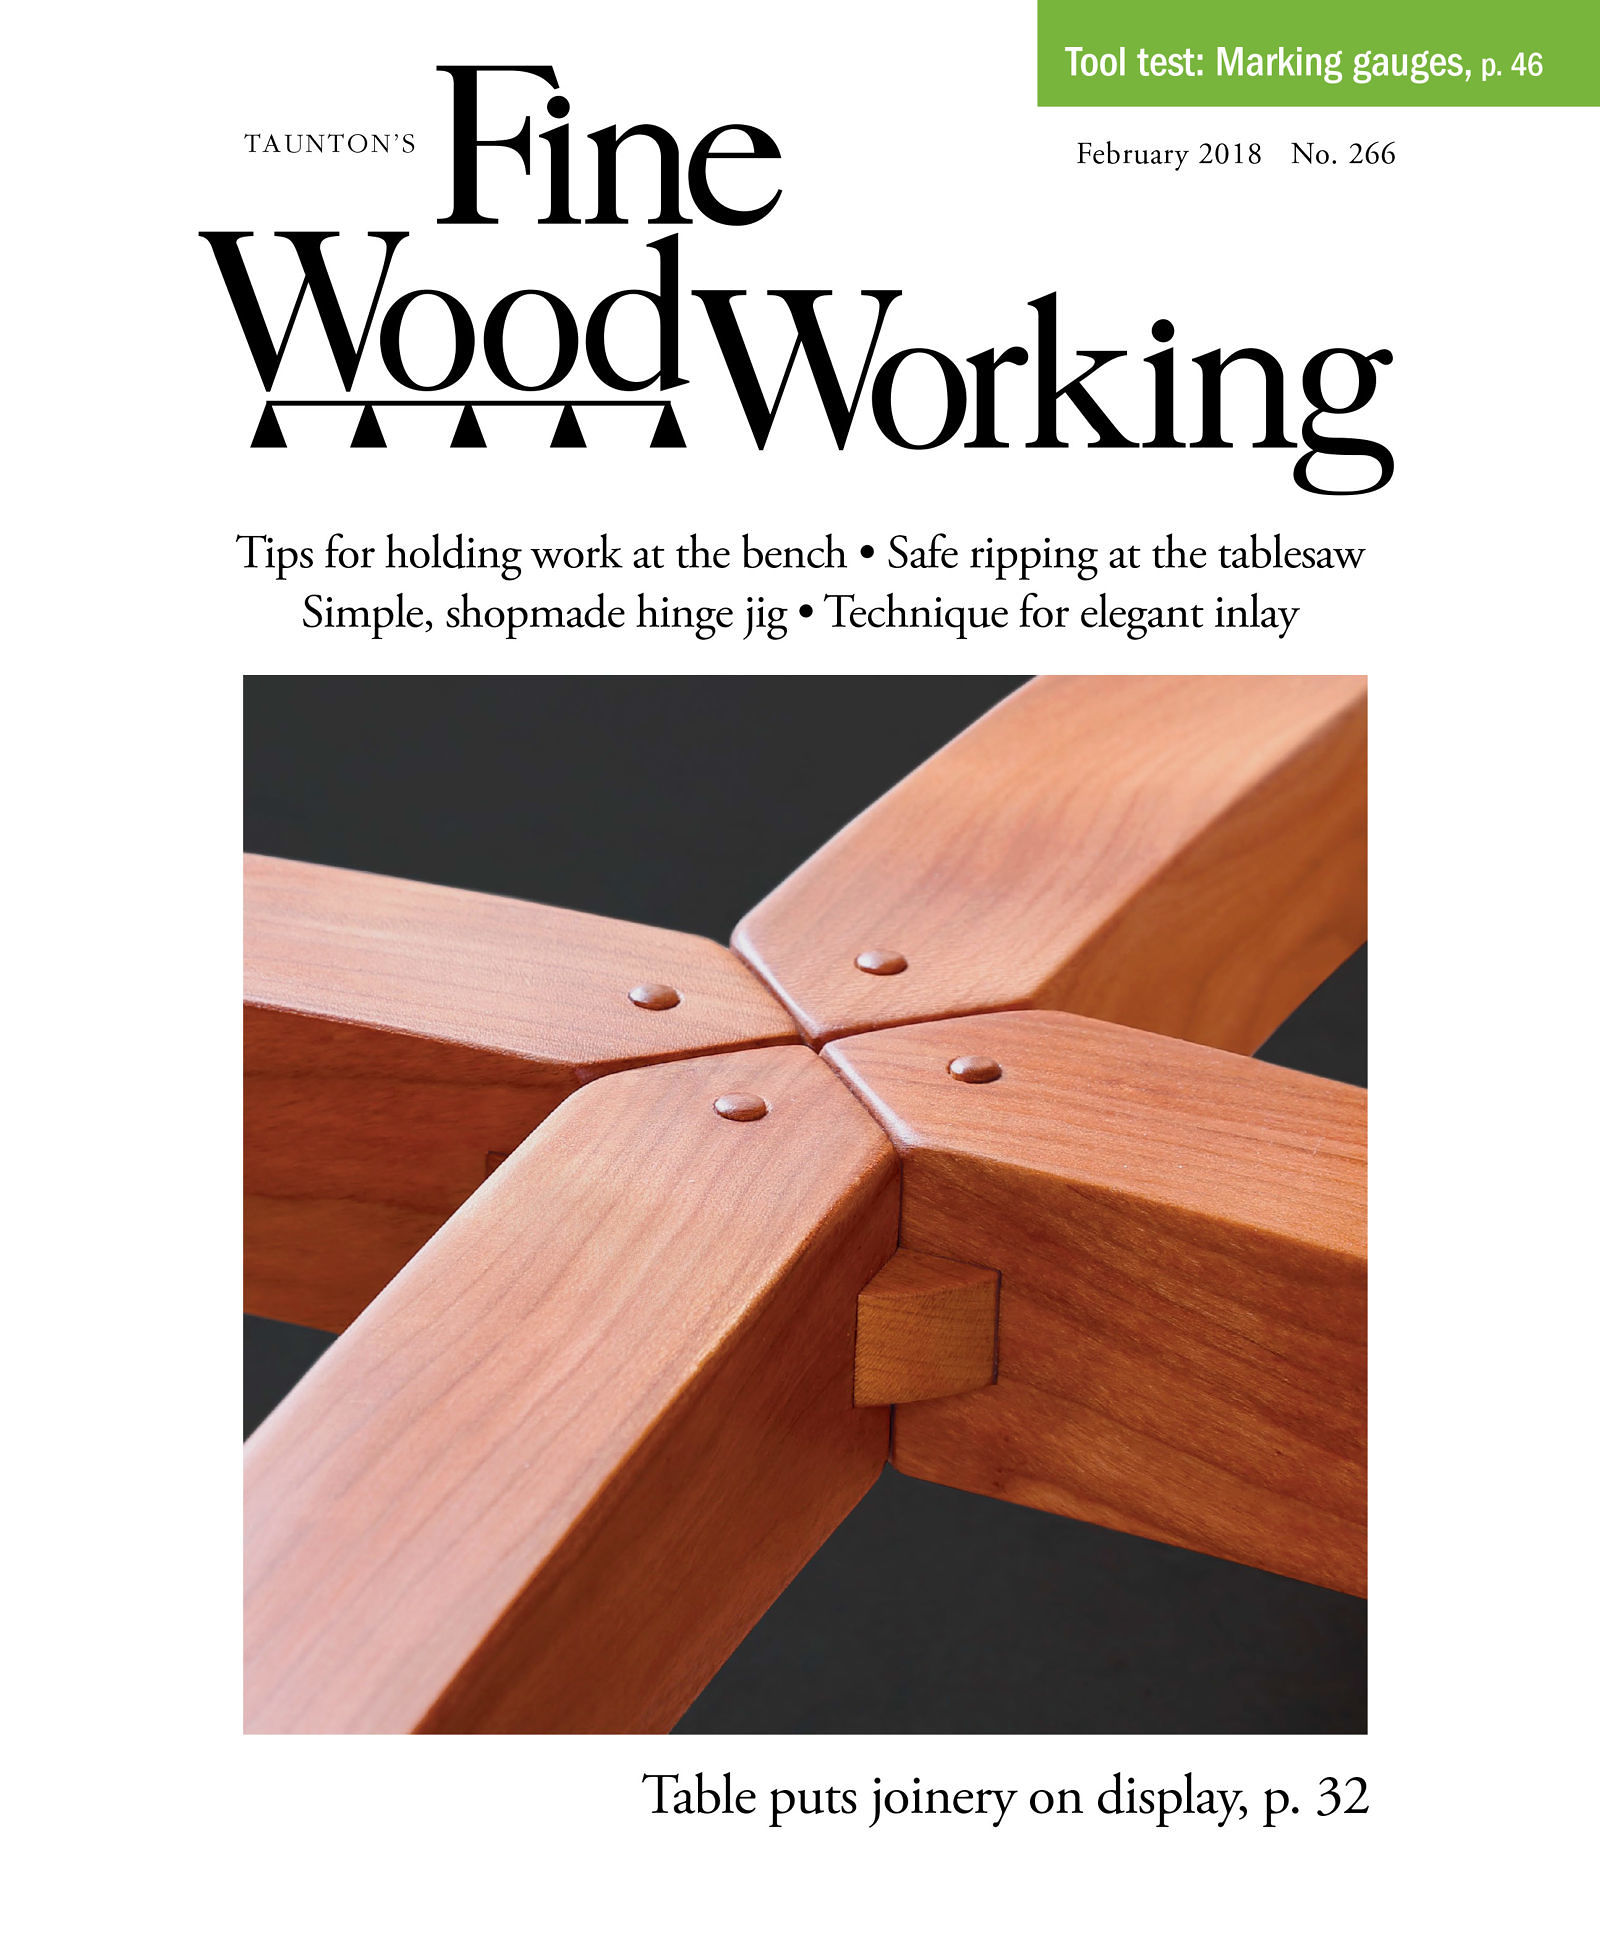 266-jan/feb 2018 - finewoodworking